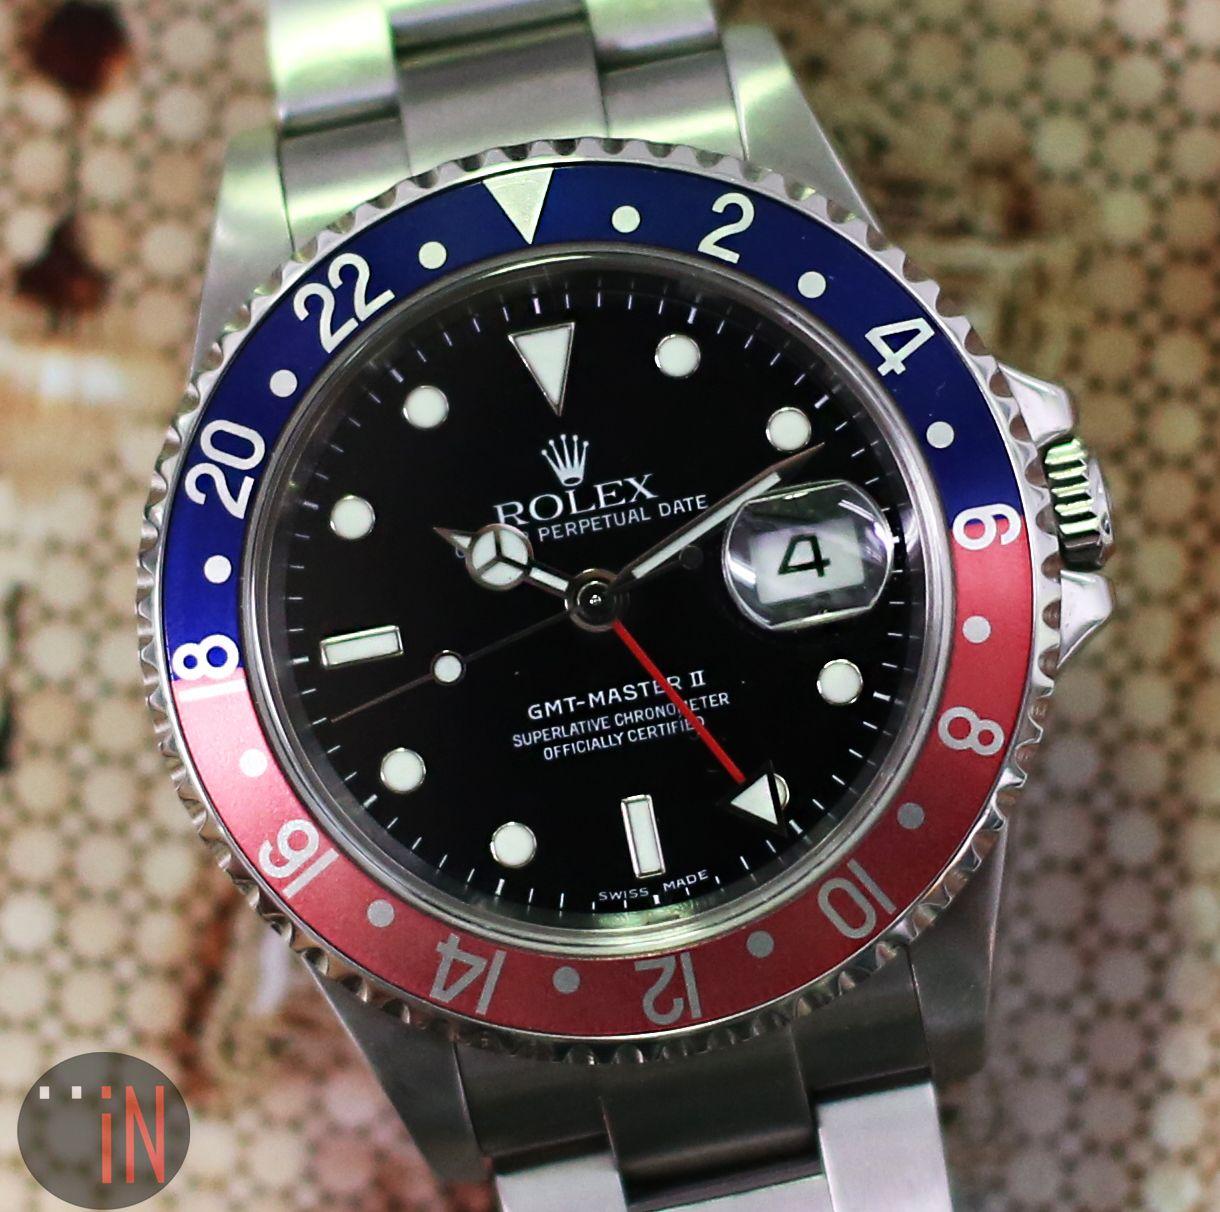 """Pop The Cap!"" #Rolex 40mm GMT-Master II #Pepsi Red/Blue Bezel Ref#: 16710 * Z Serial, circa 2006 http://www.elementintime.com/Rolex-GMT-Master-II-16710-Stainless-Steel-Pepsi-Red-Blue-Bezel-Used"